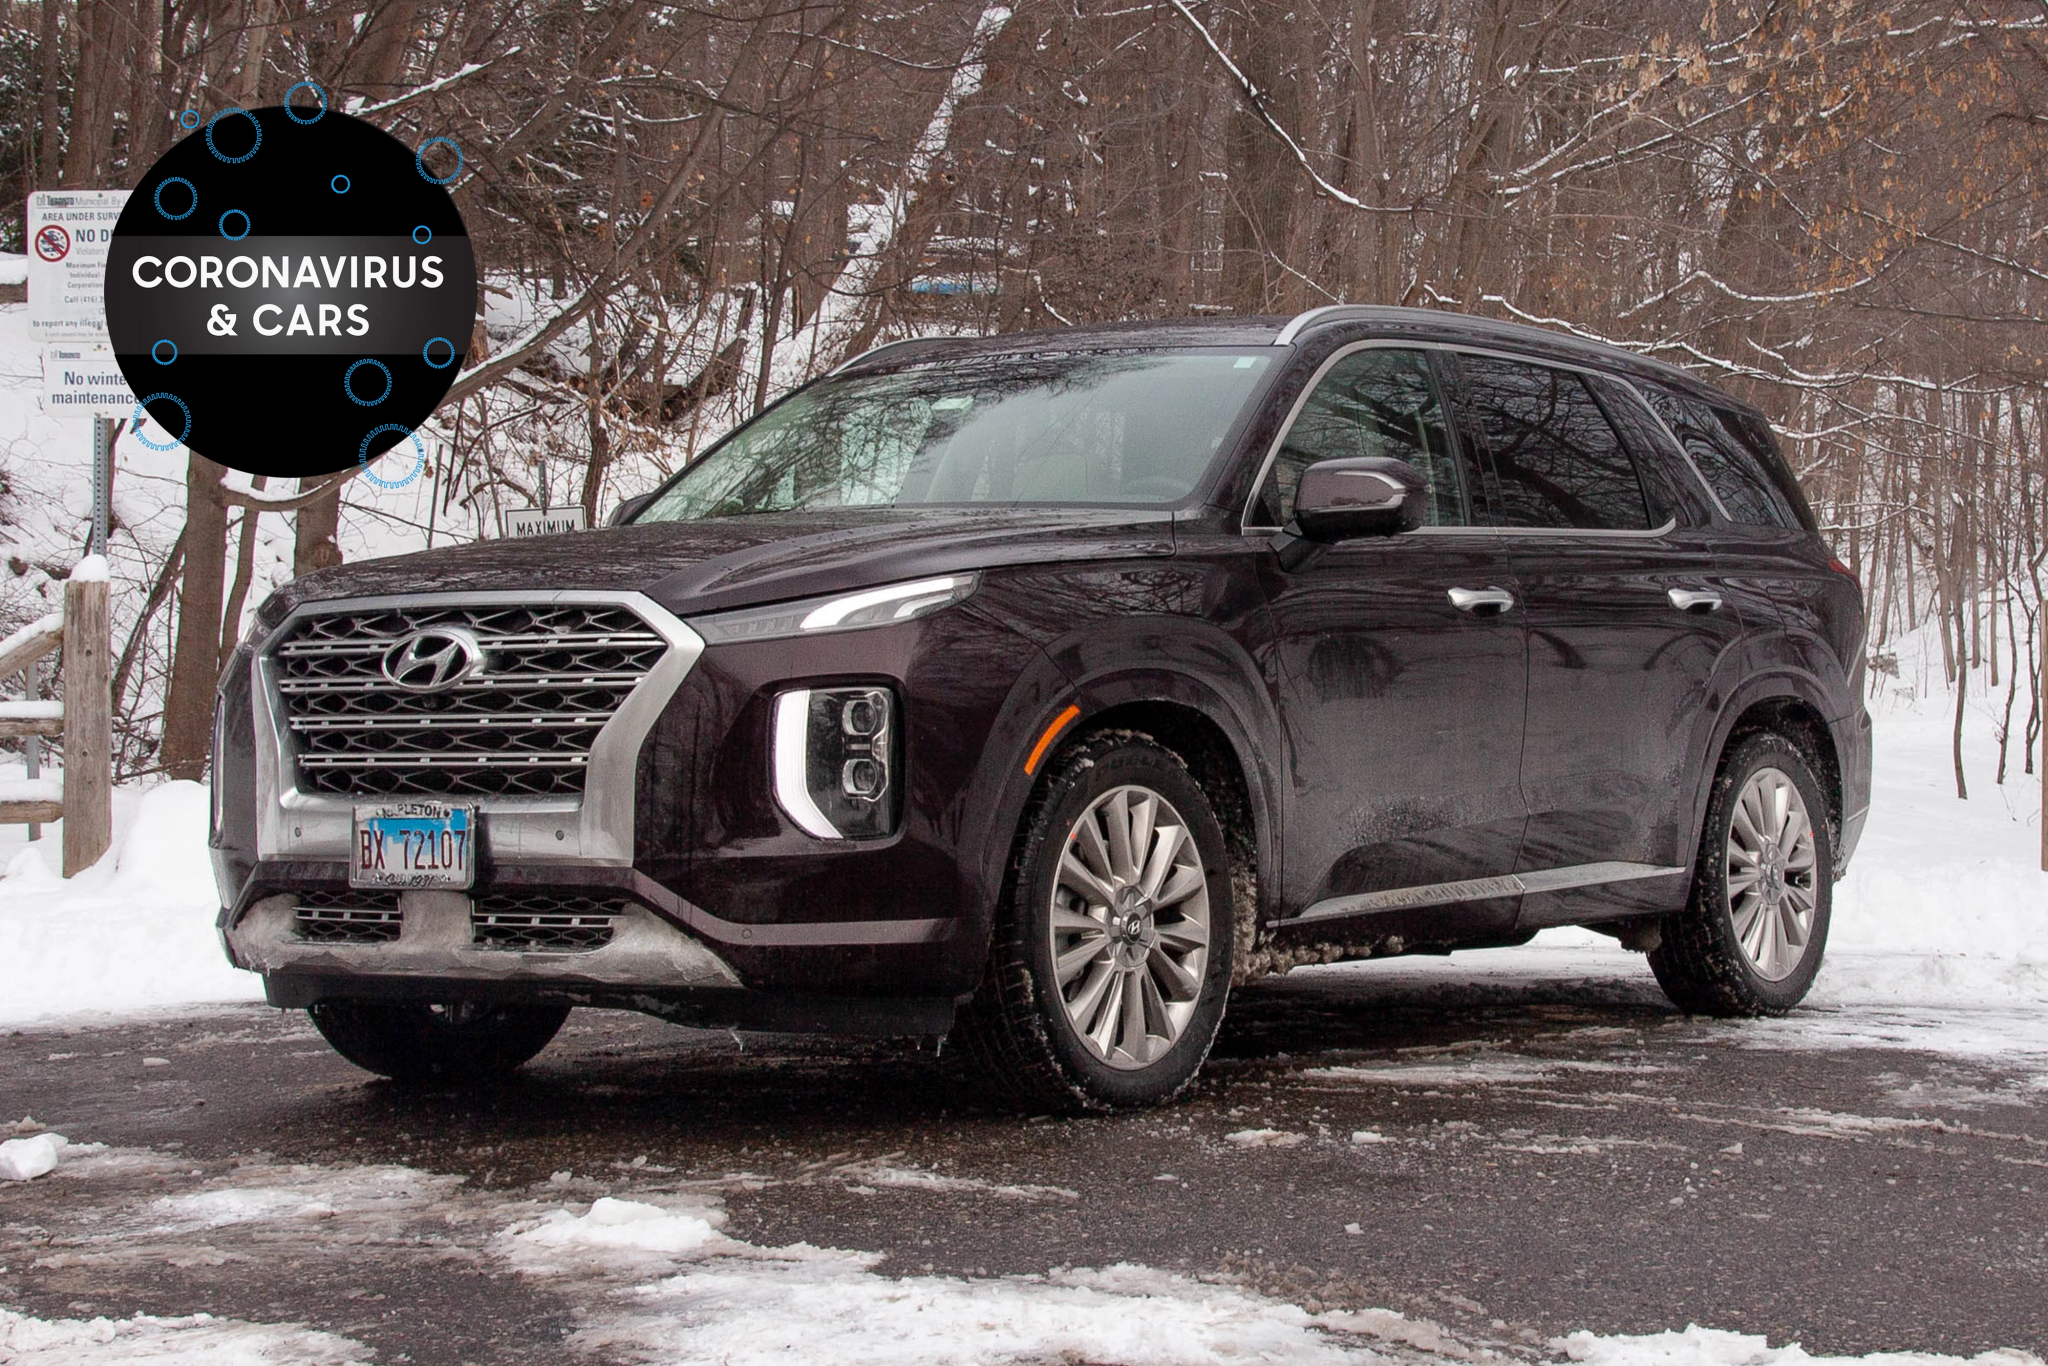 Coronavirus and Cars: Hyundai Extends Expiring Warranties, Offers Social-Distancing Service, Sales